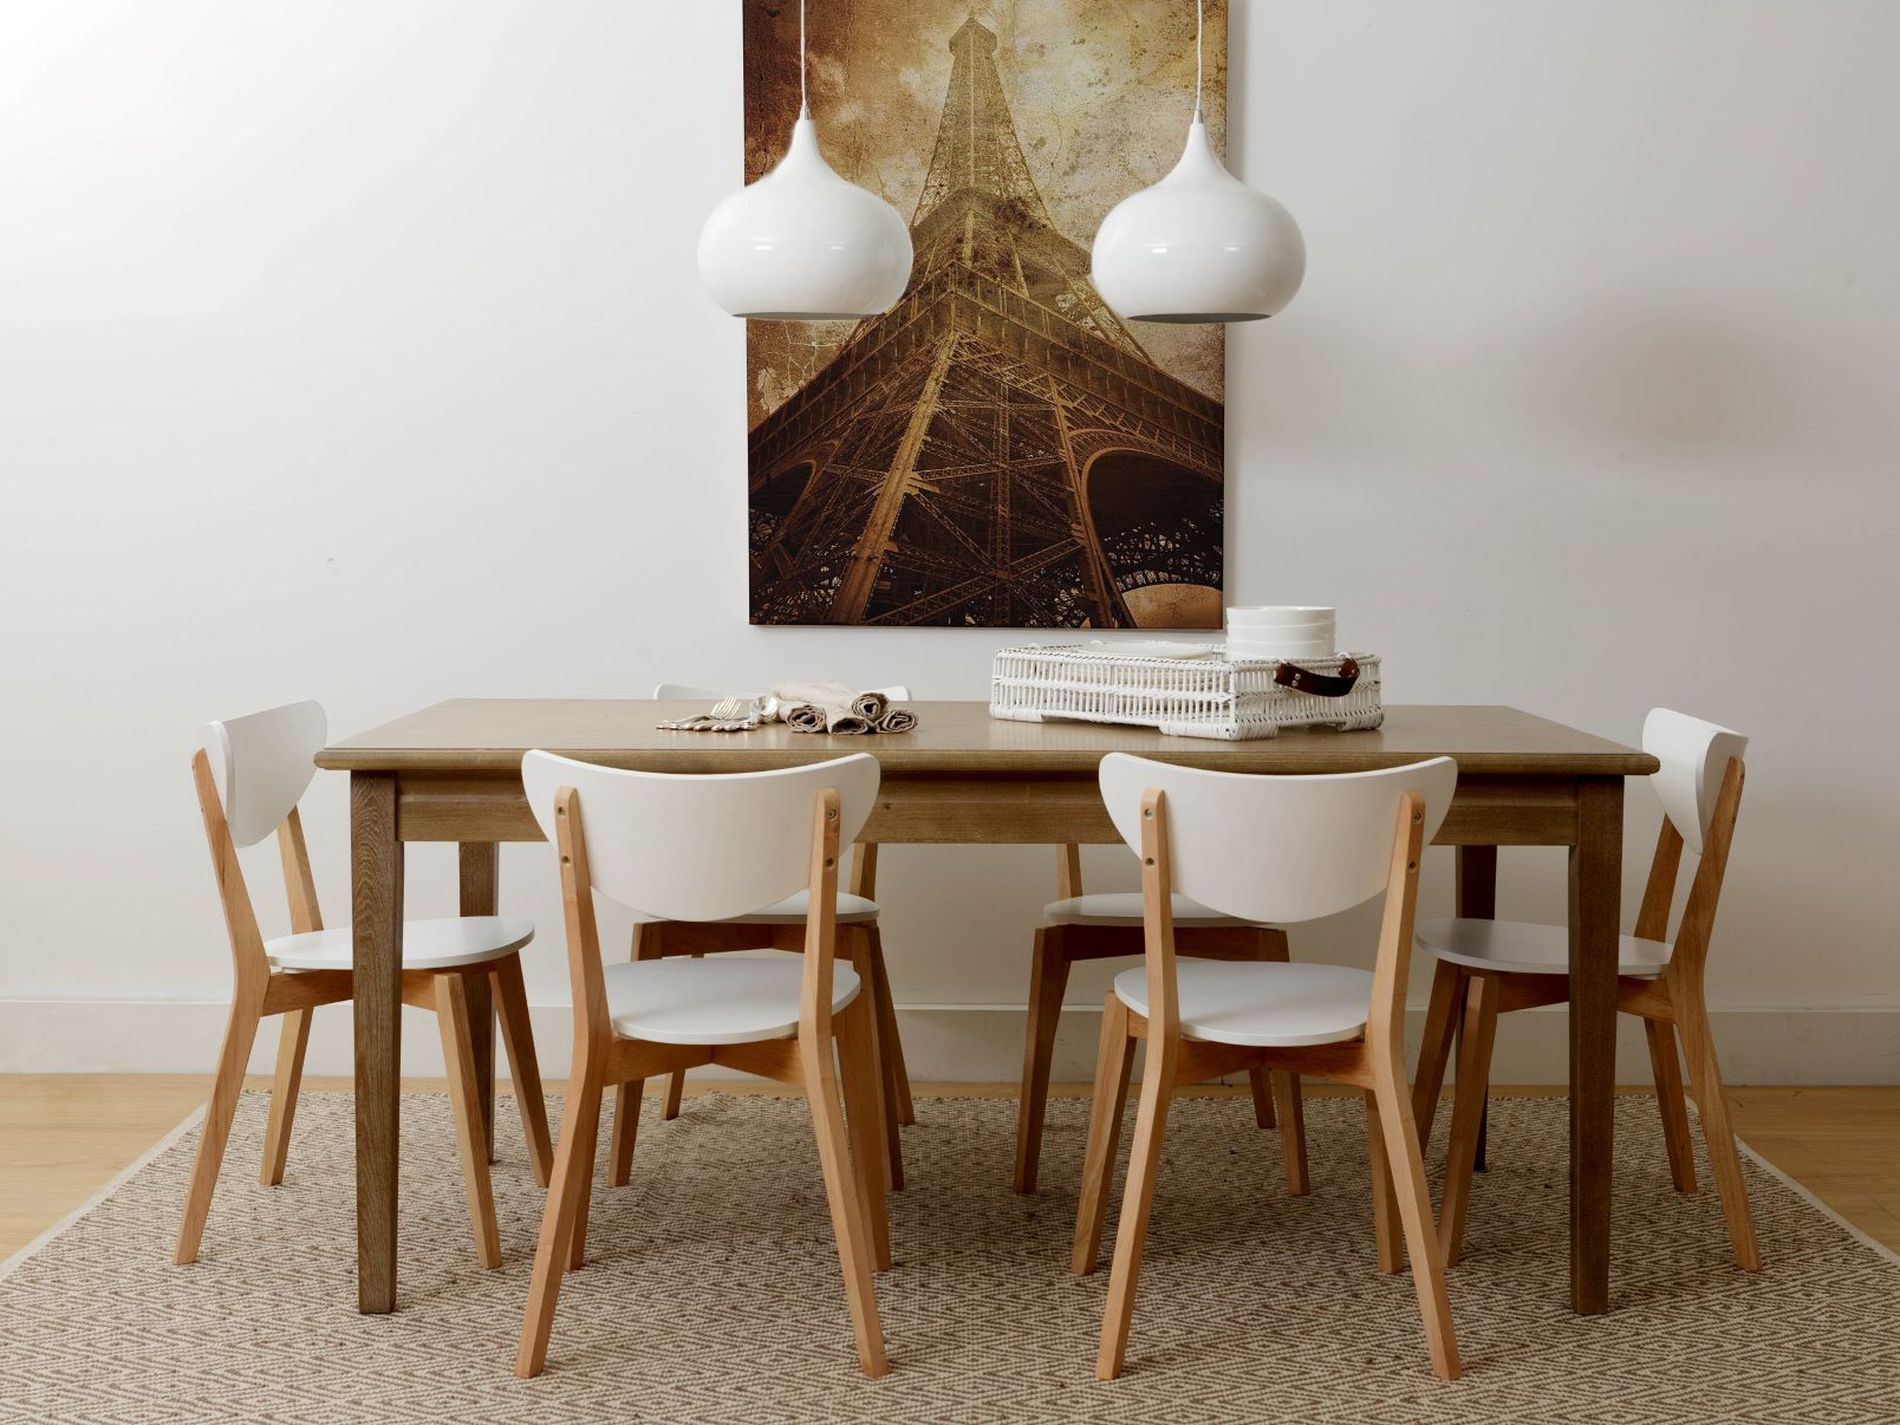 Decorative Lighting Wholesale/Distributor Business For Sale